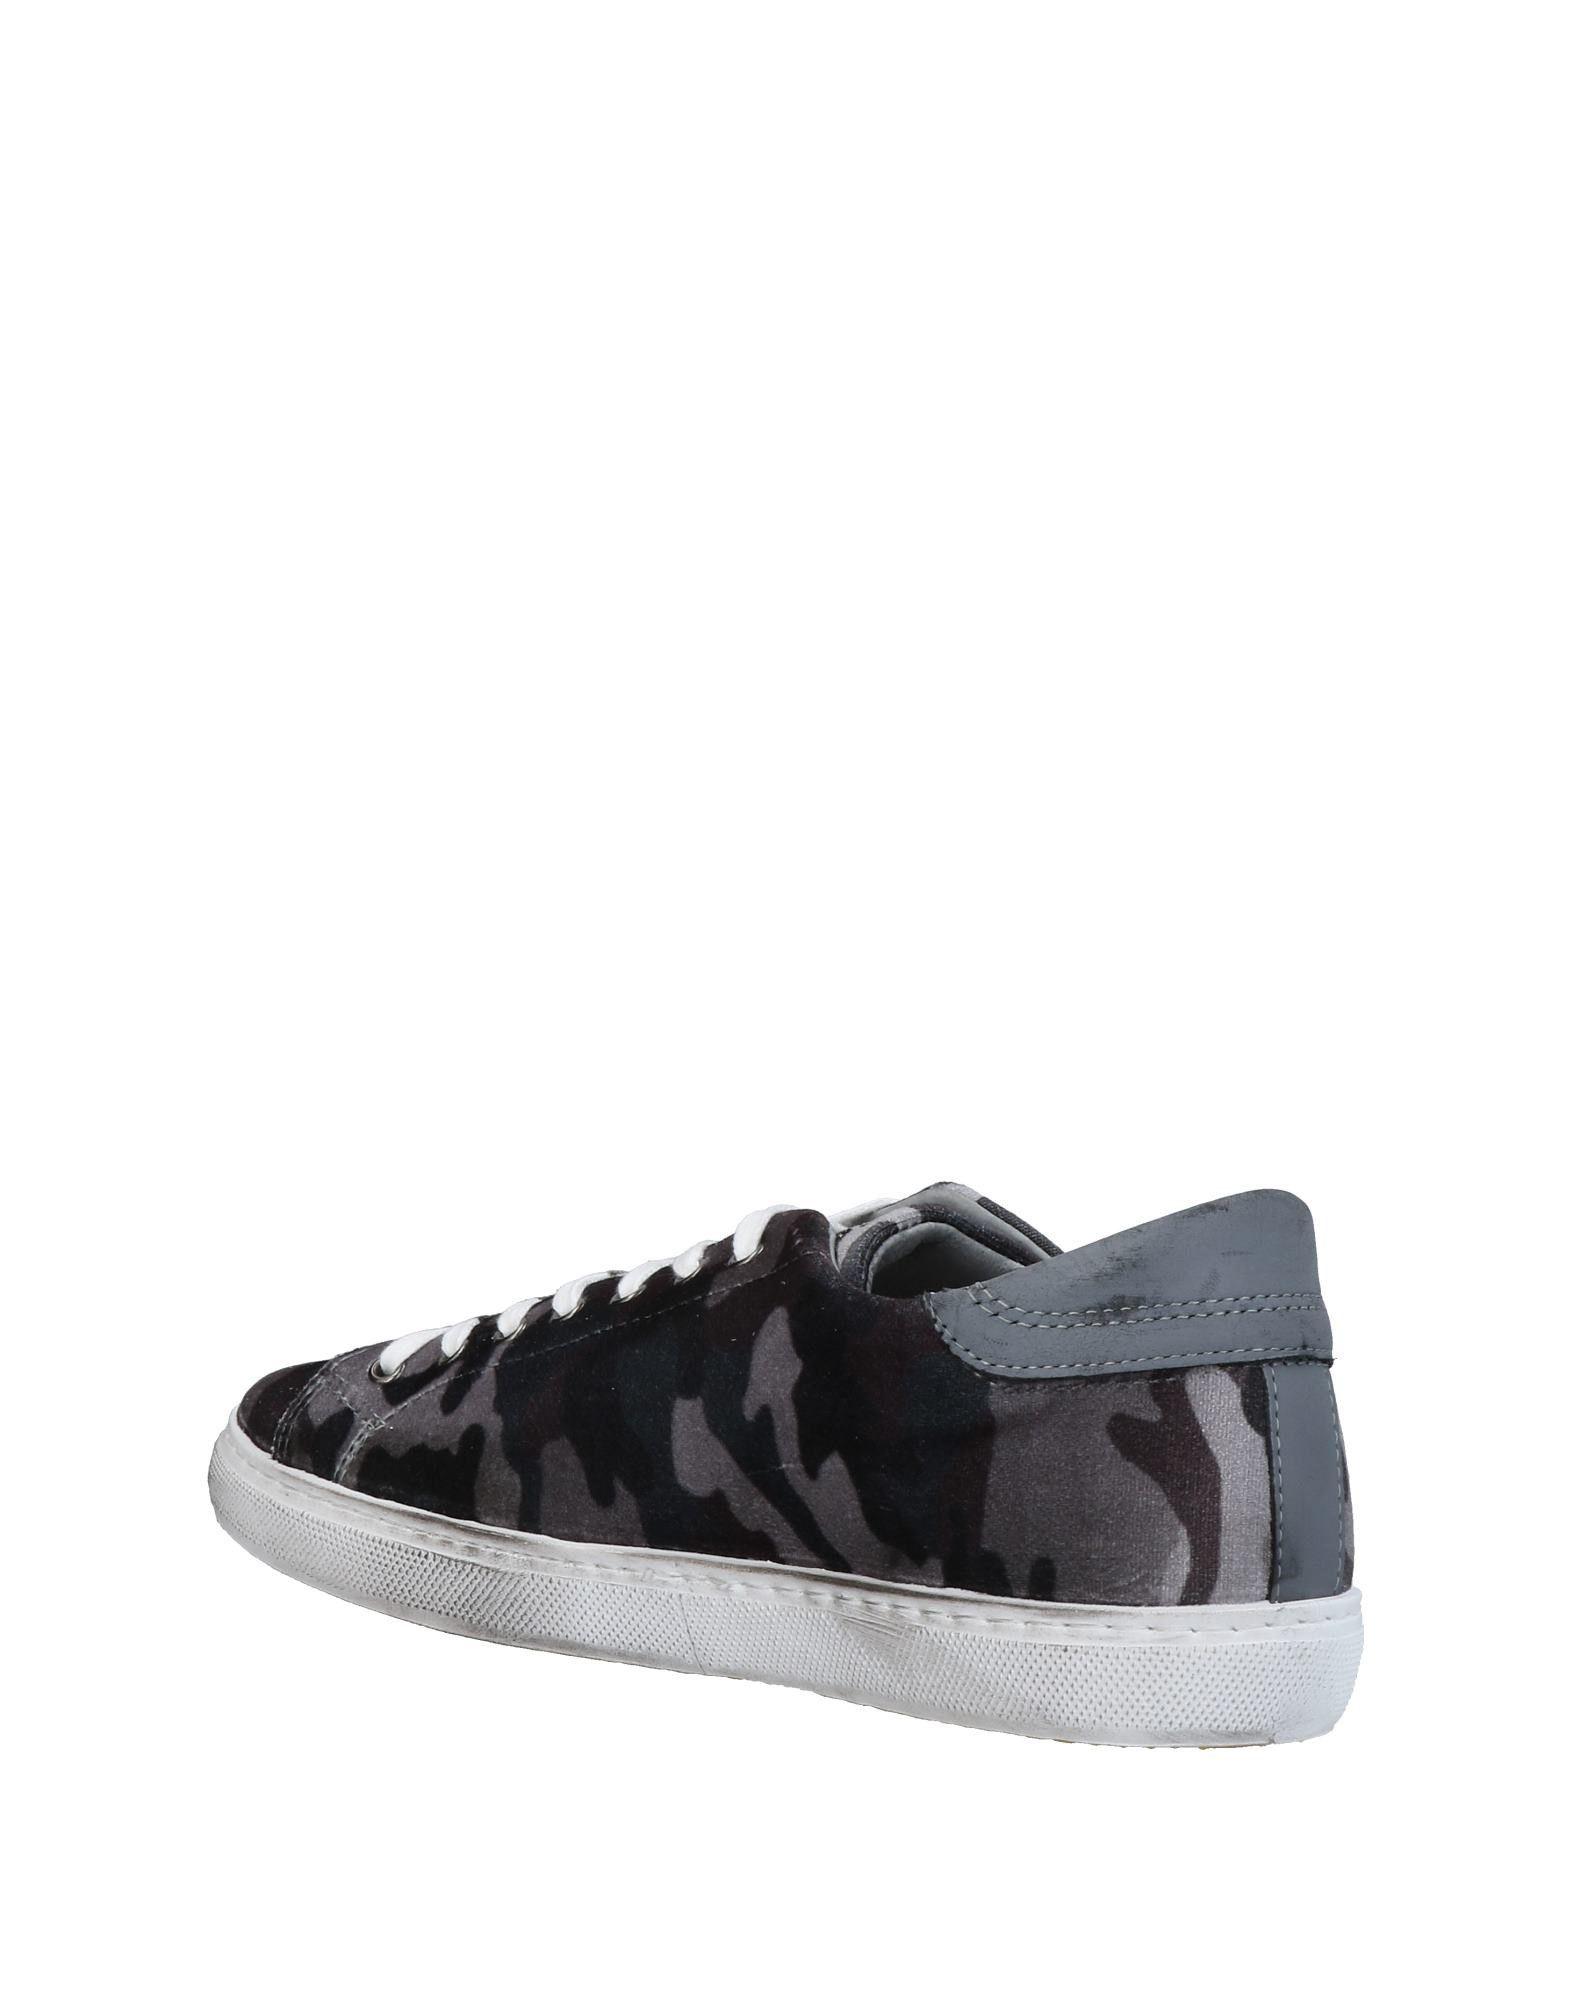 2Star Sneakers Sneakers 2Star Herren  11453477BT 3a55c3